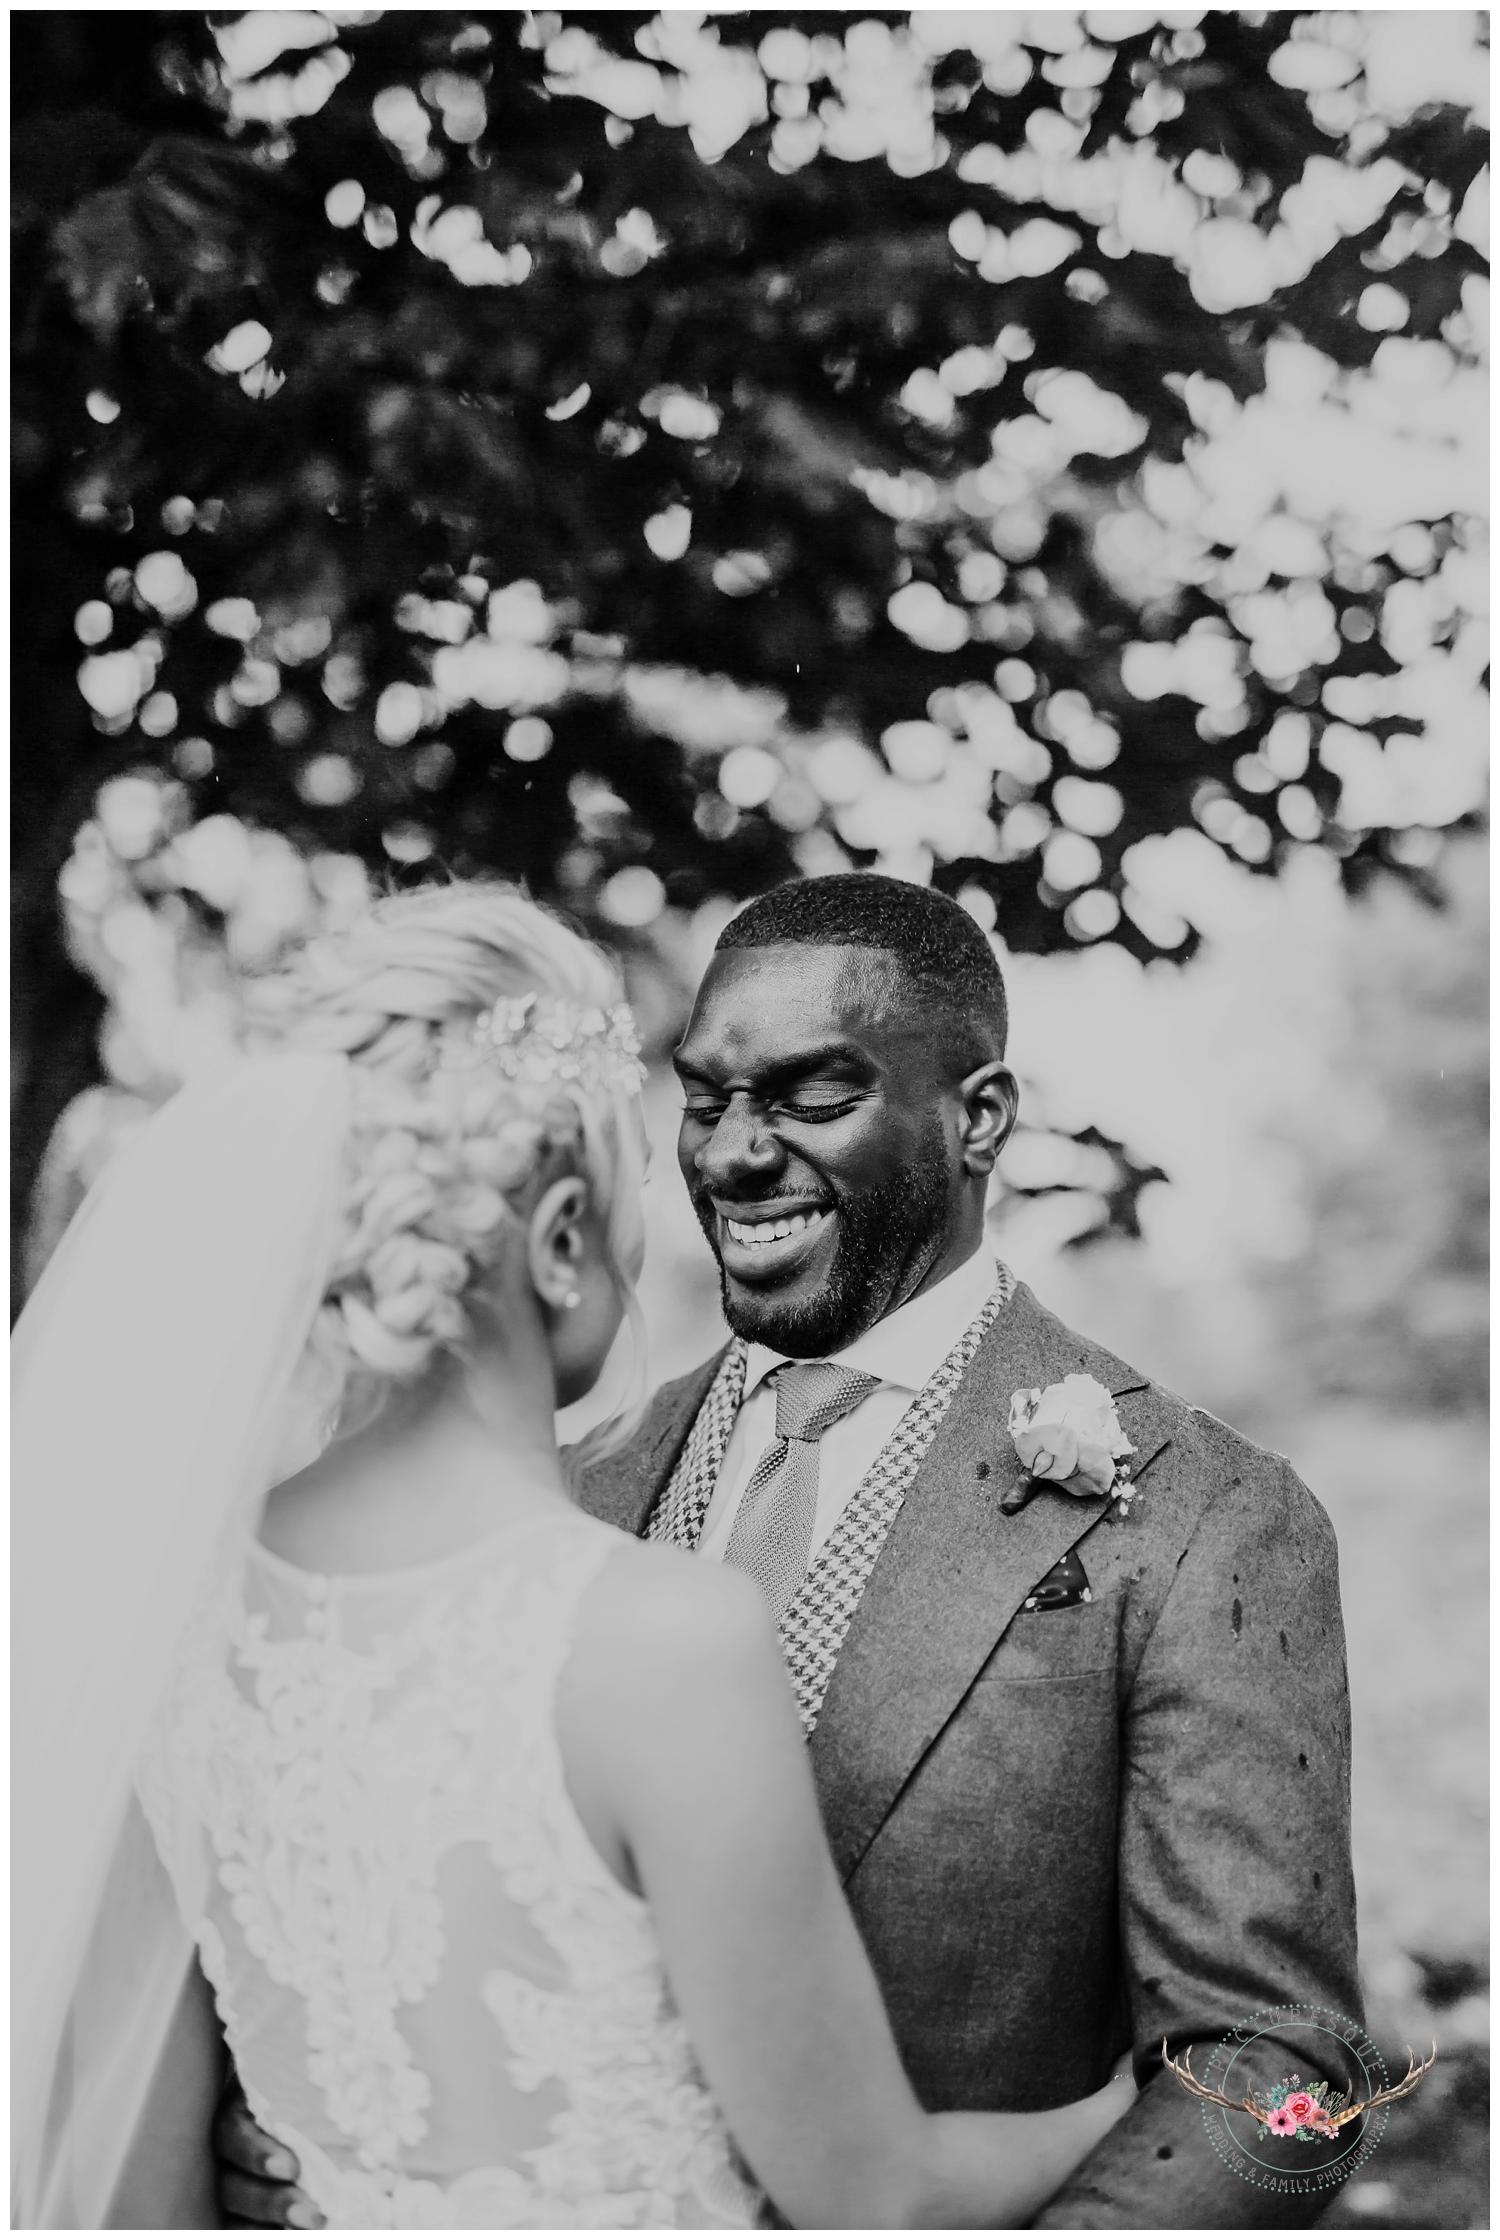 Kinkell Byre, Scottish wedding, Picturesque, WeddingPhotography, Scotland_0055.jpg